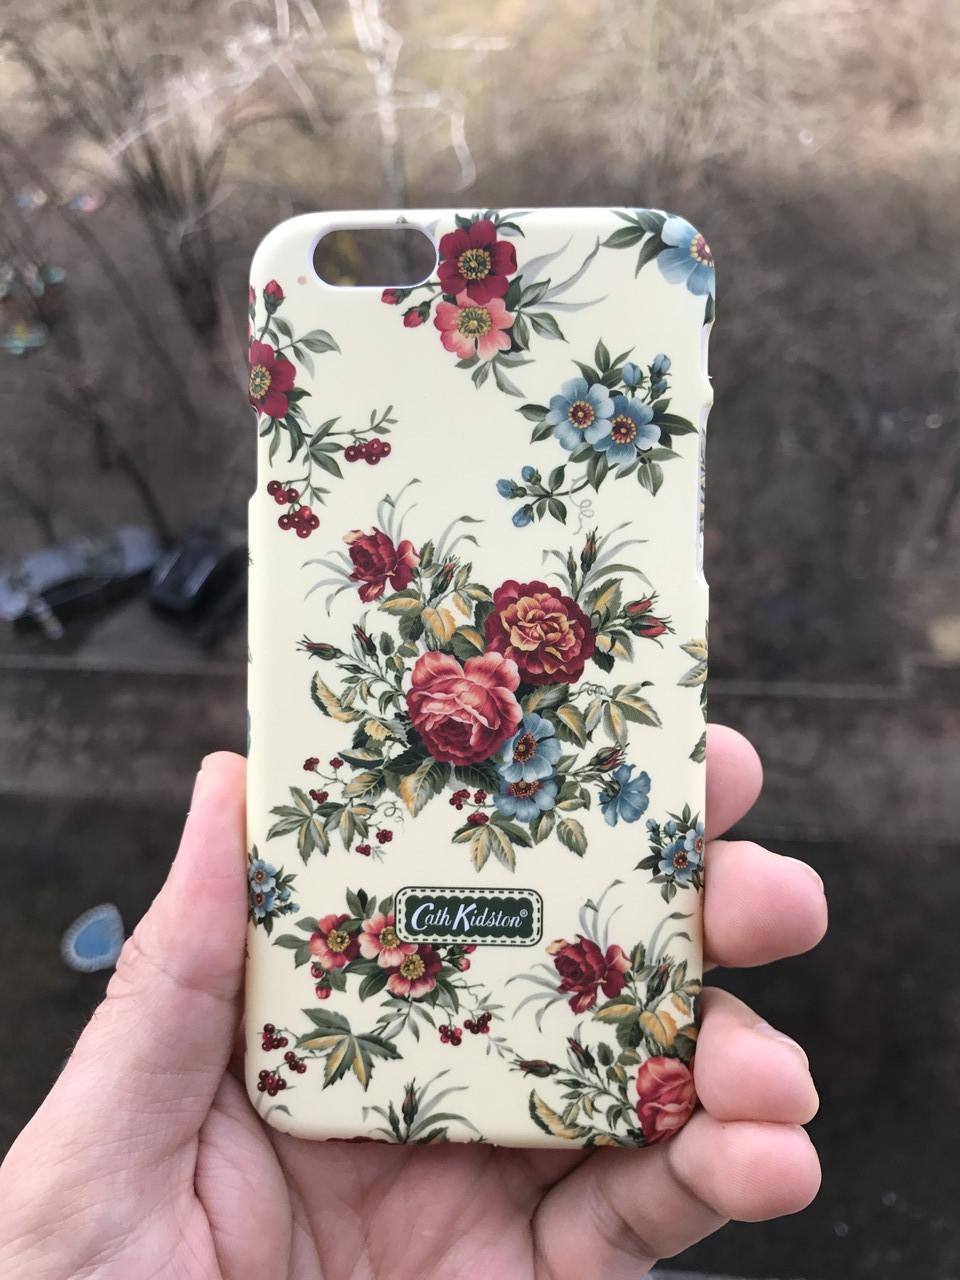 Чехол для iPhone 6\6s Cath Kidston Flowers + защитное стекло на экран в подарок